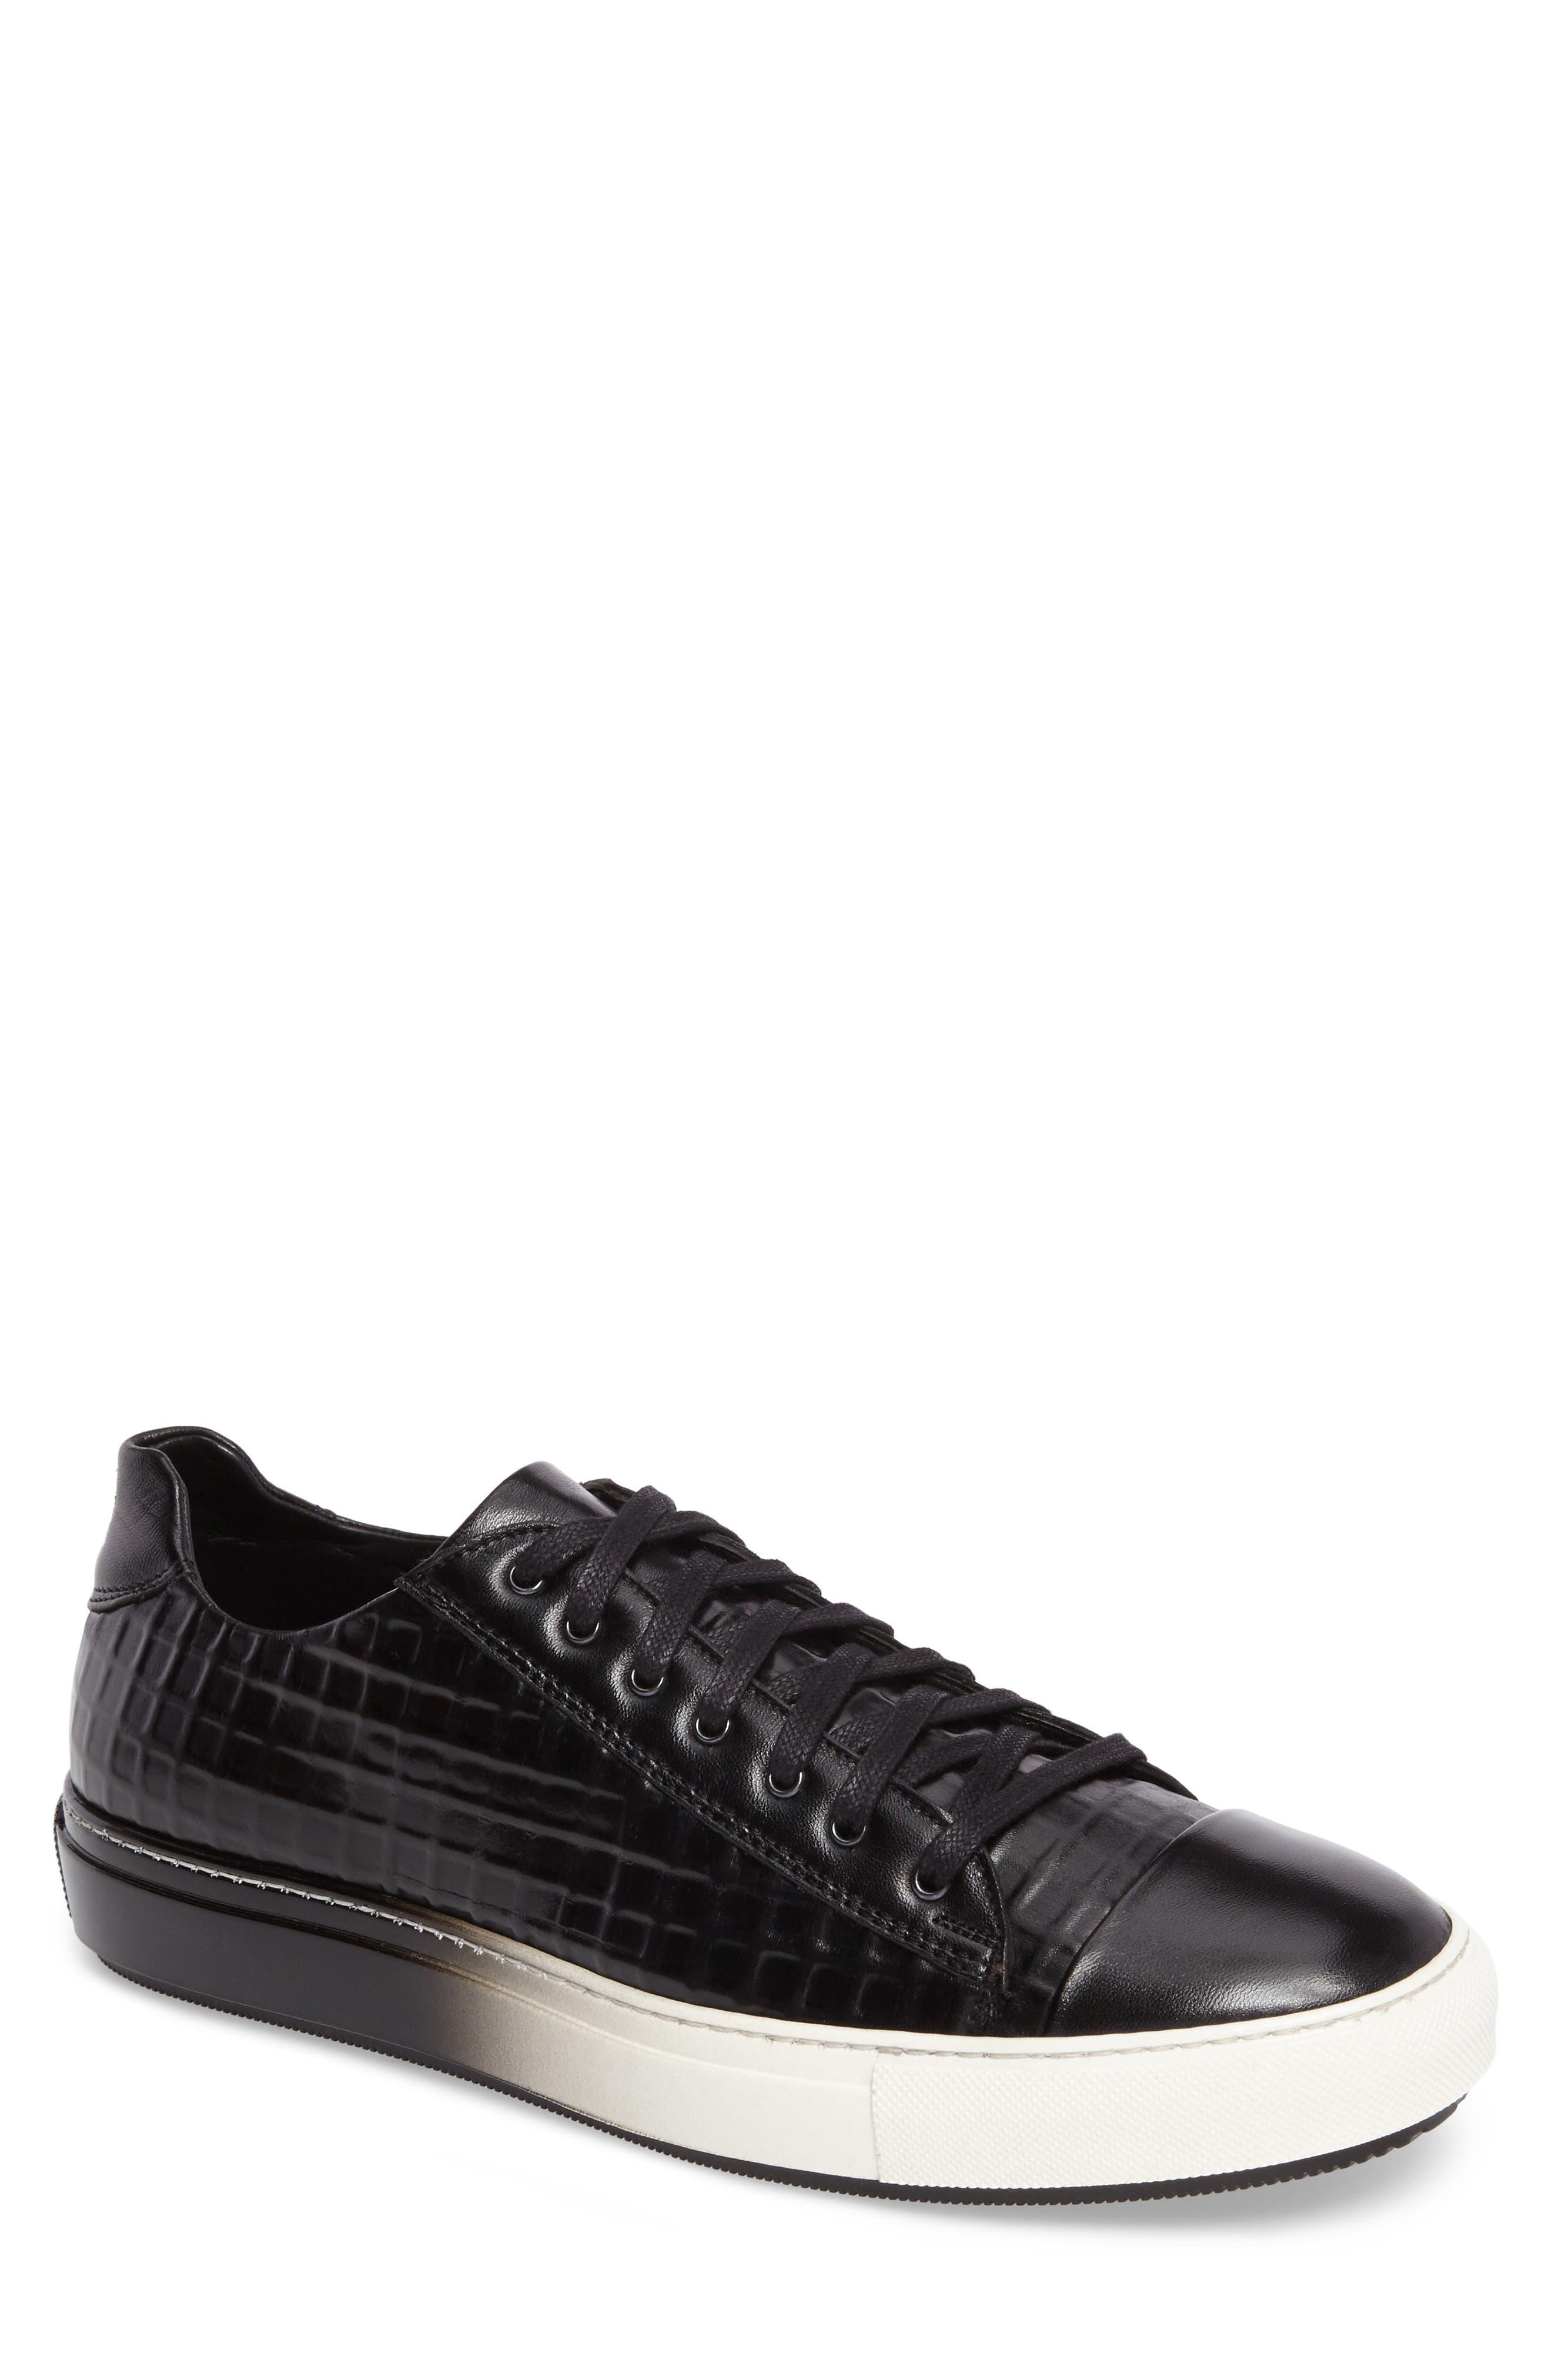 Vera II Sneaker,                             Main thumbnail 1, color,                             Black Leather